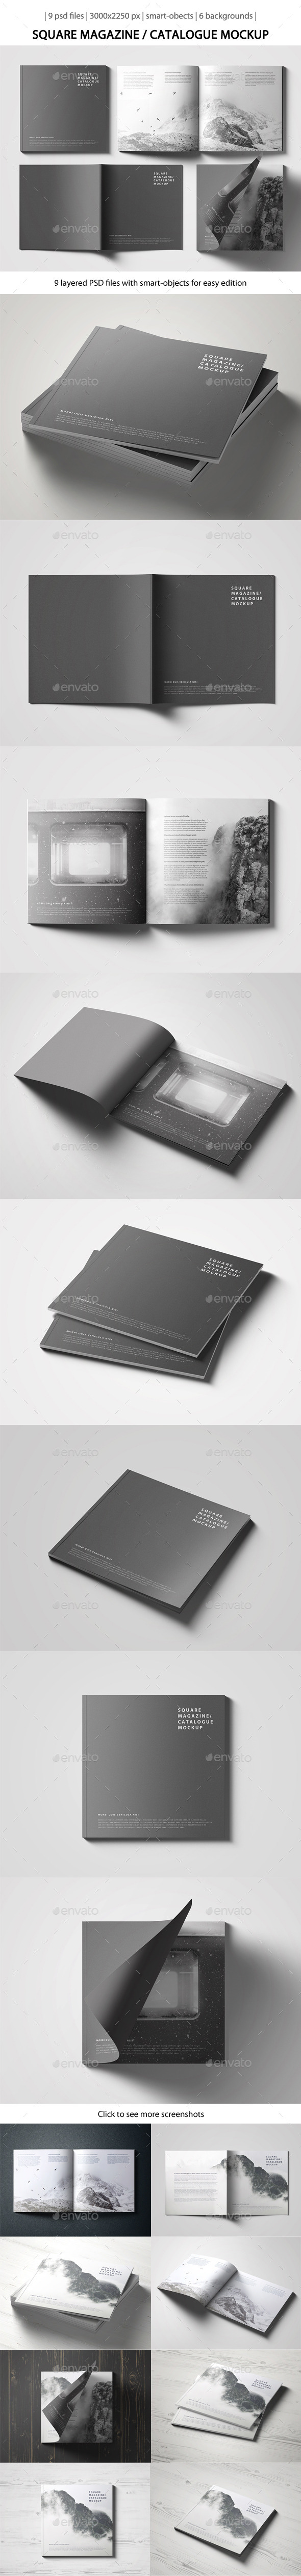 Square Magazine / Catalogue Mockup - Magazines Print